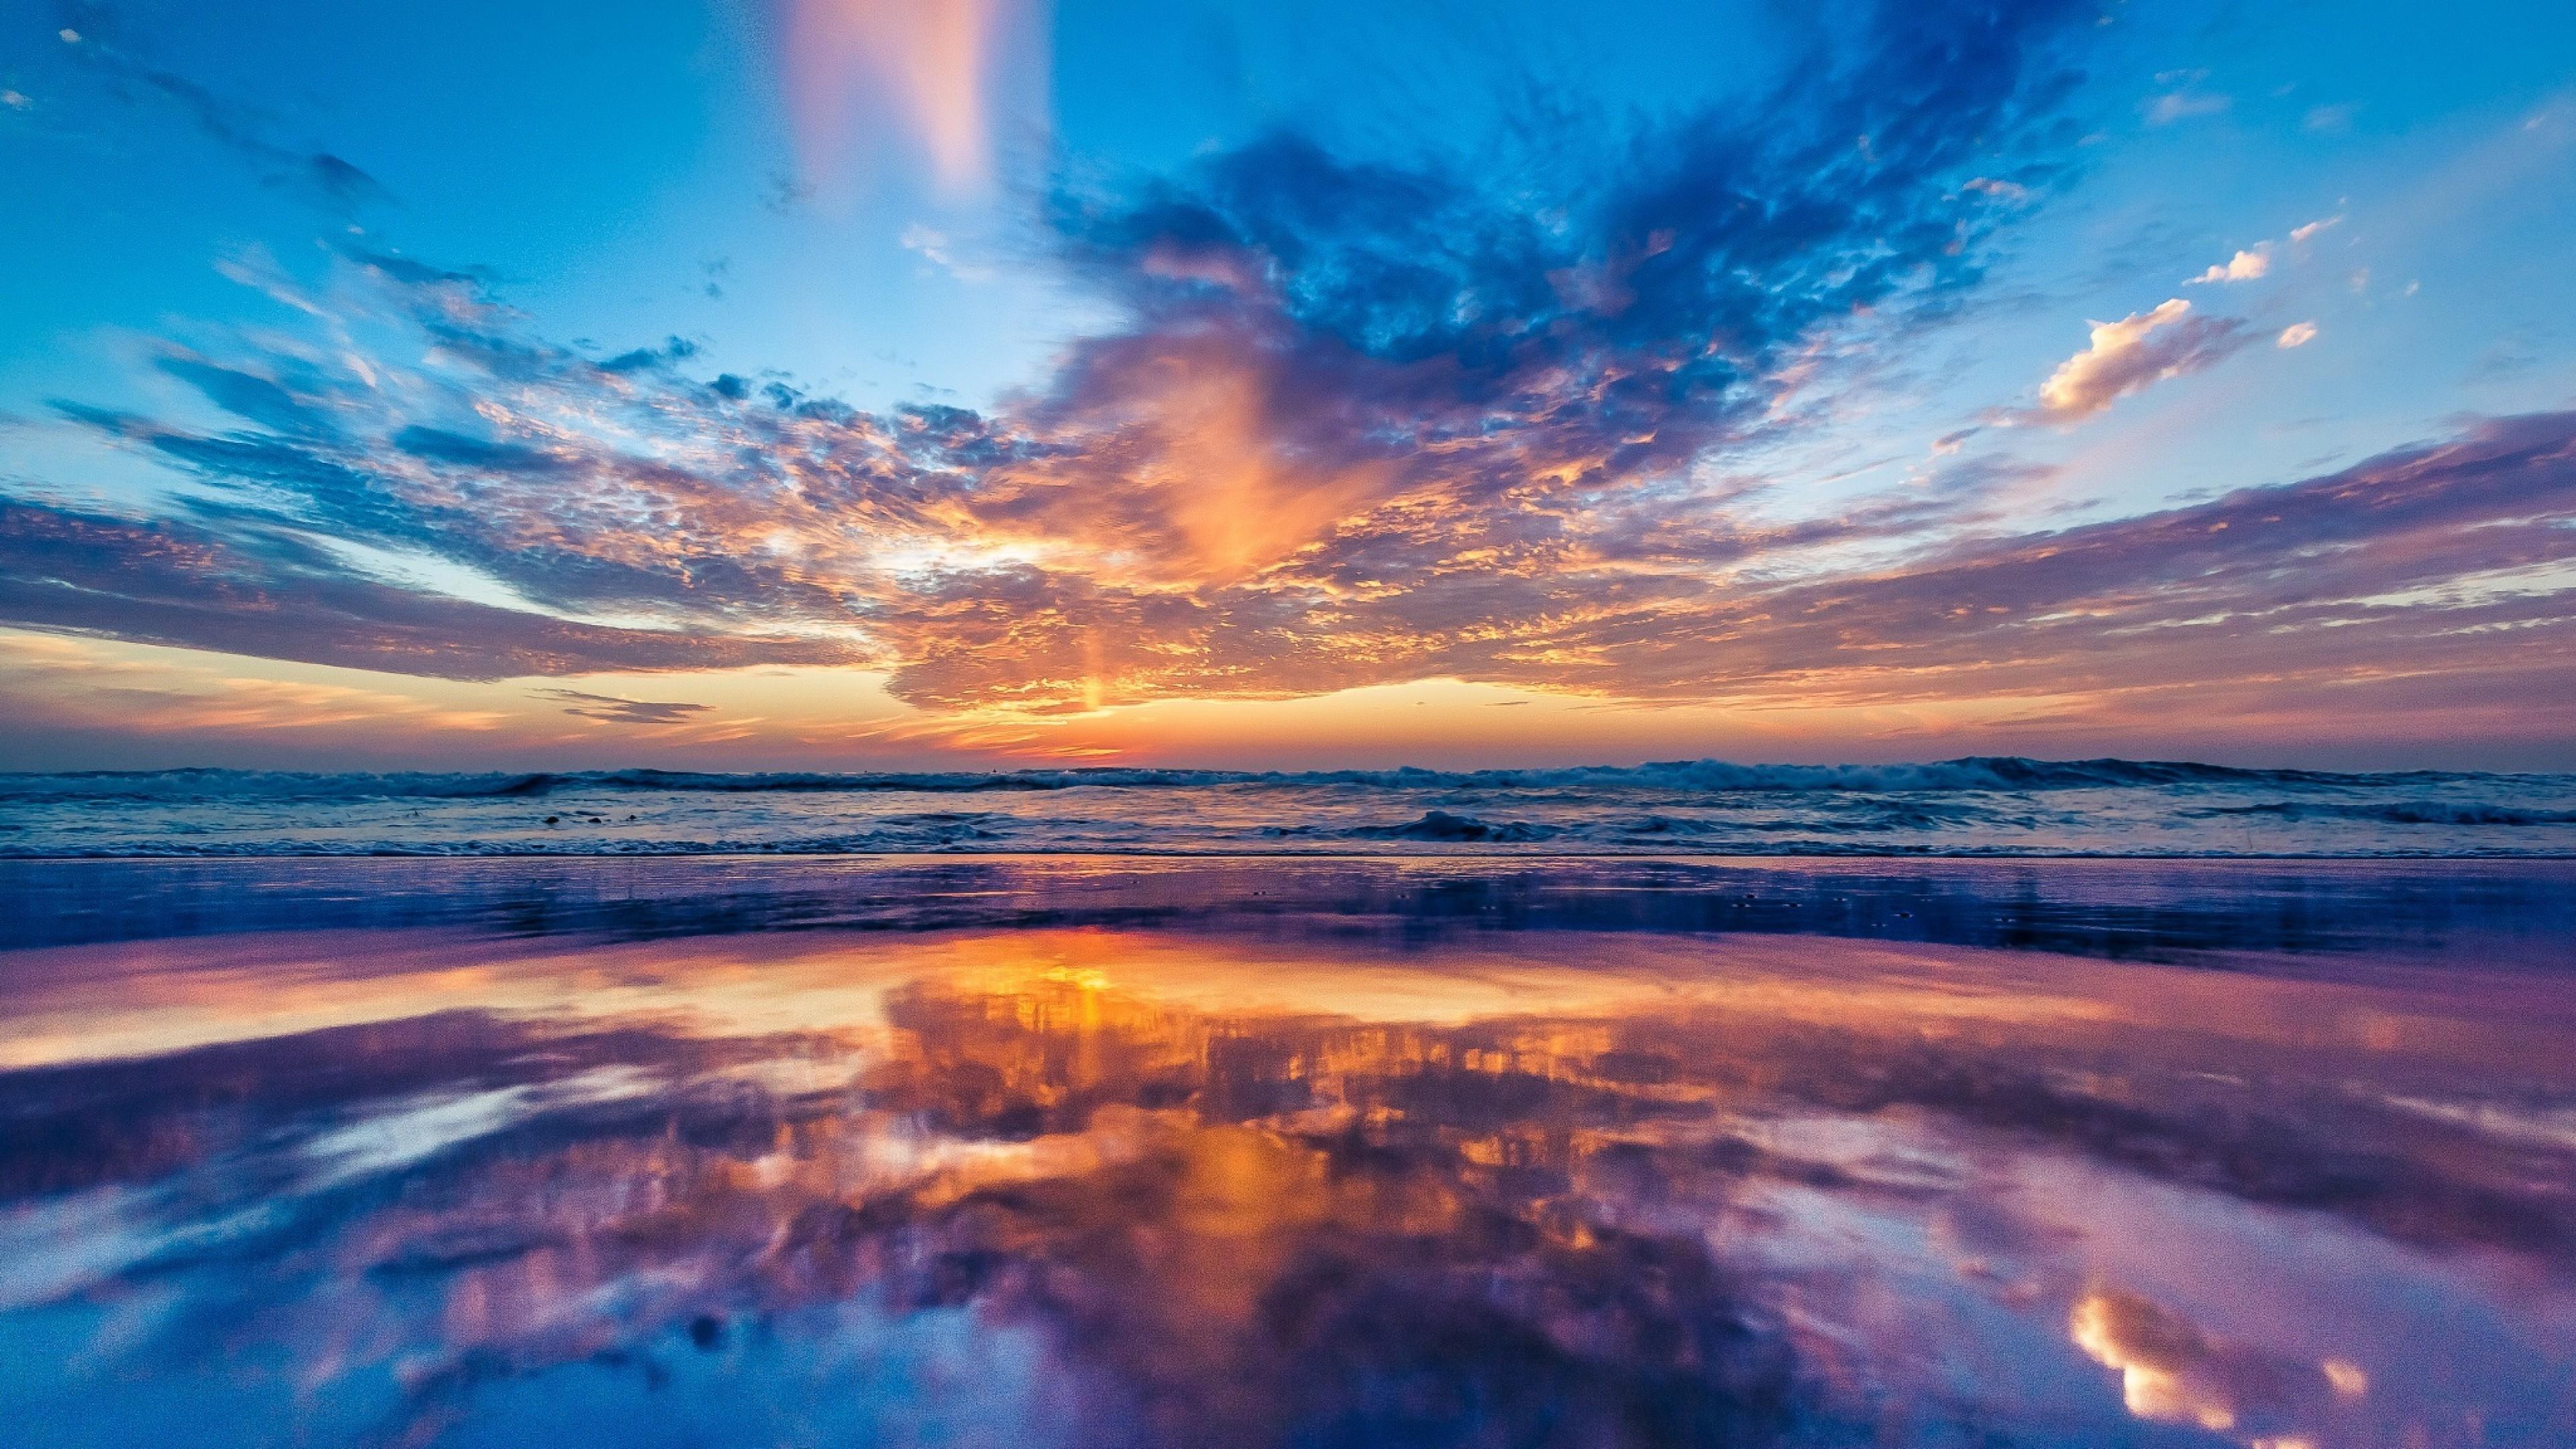 Res: 3840x2160, Ocean Horizon Sunset Wallpaper 6 - 3840 X 2160